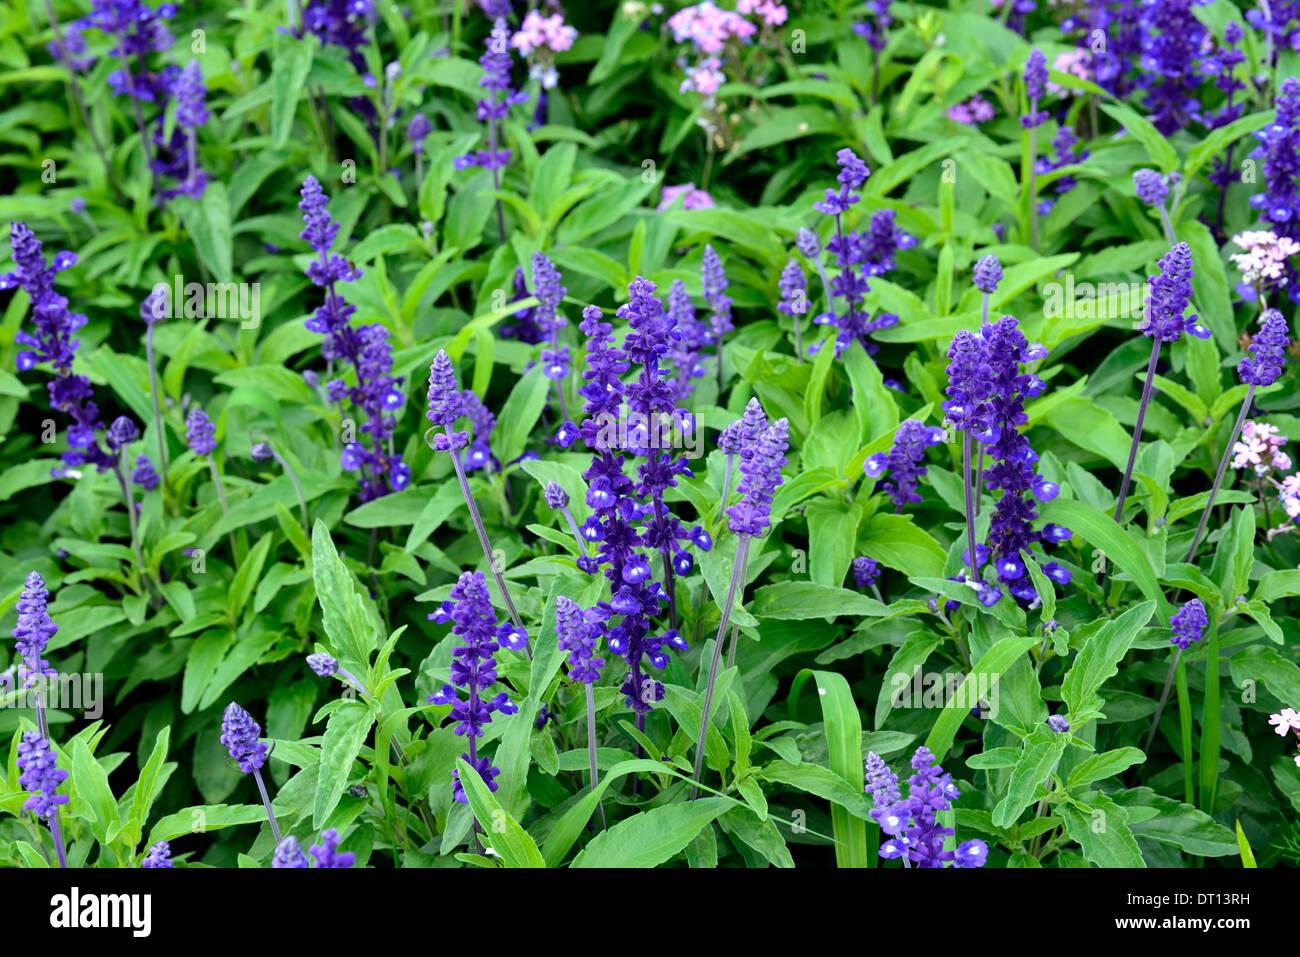 Perennials With Purple Flowers Gallery Fresh Lotus Flowers